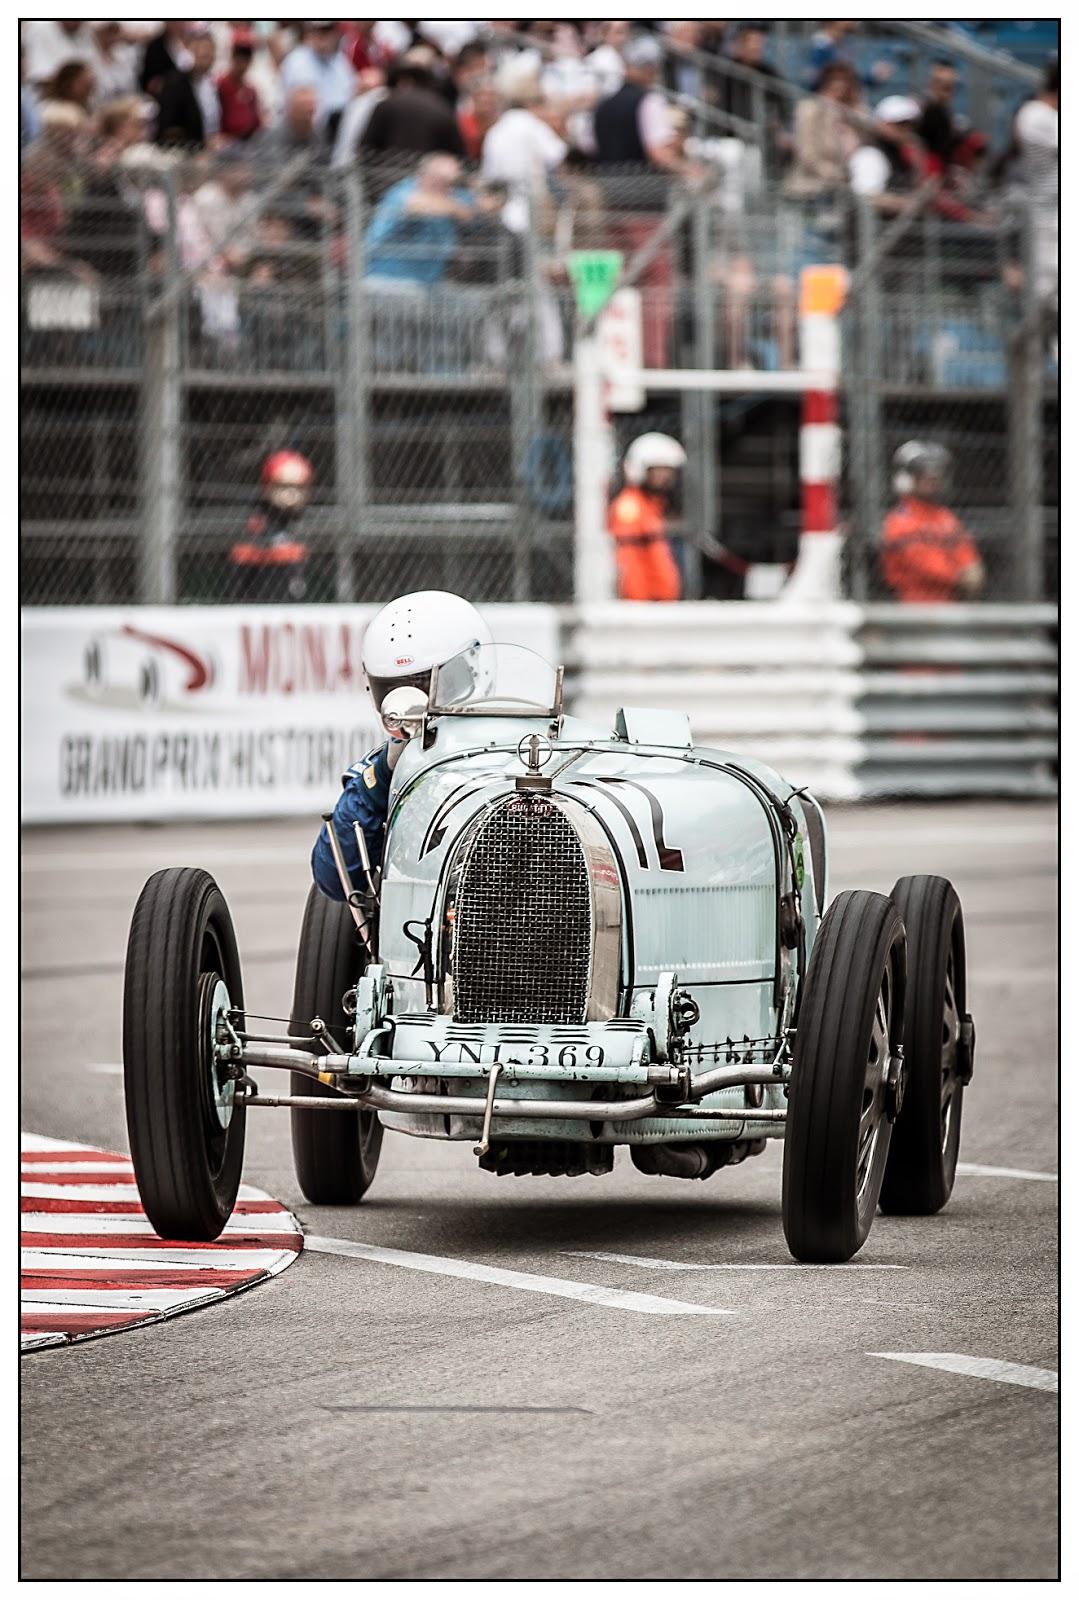 Monaco Historic Gran Prix 2014